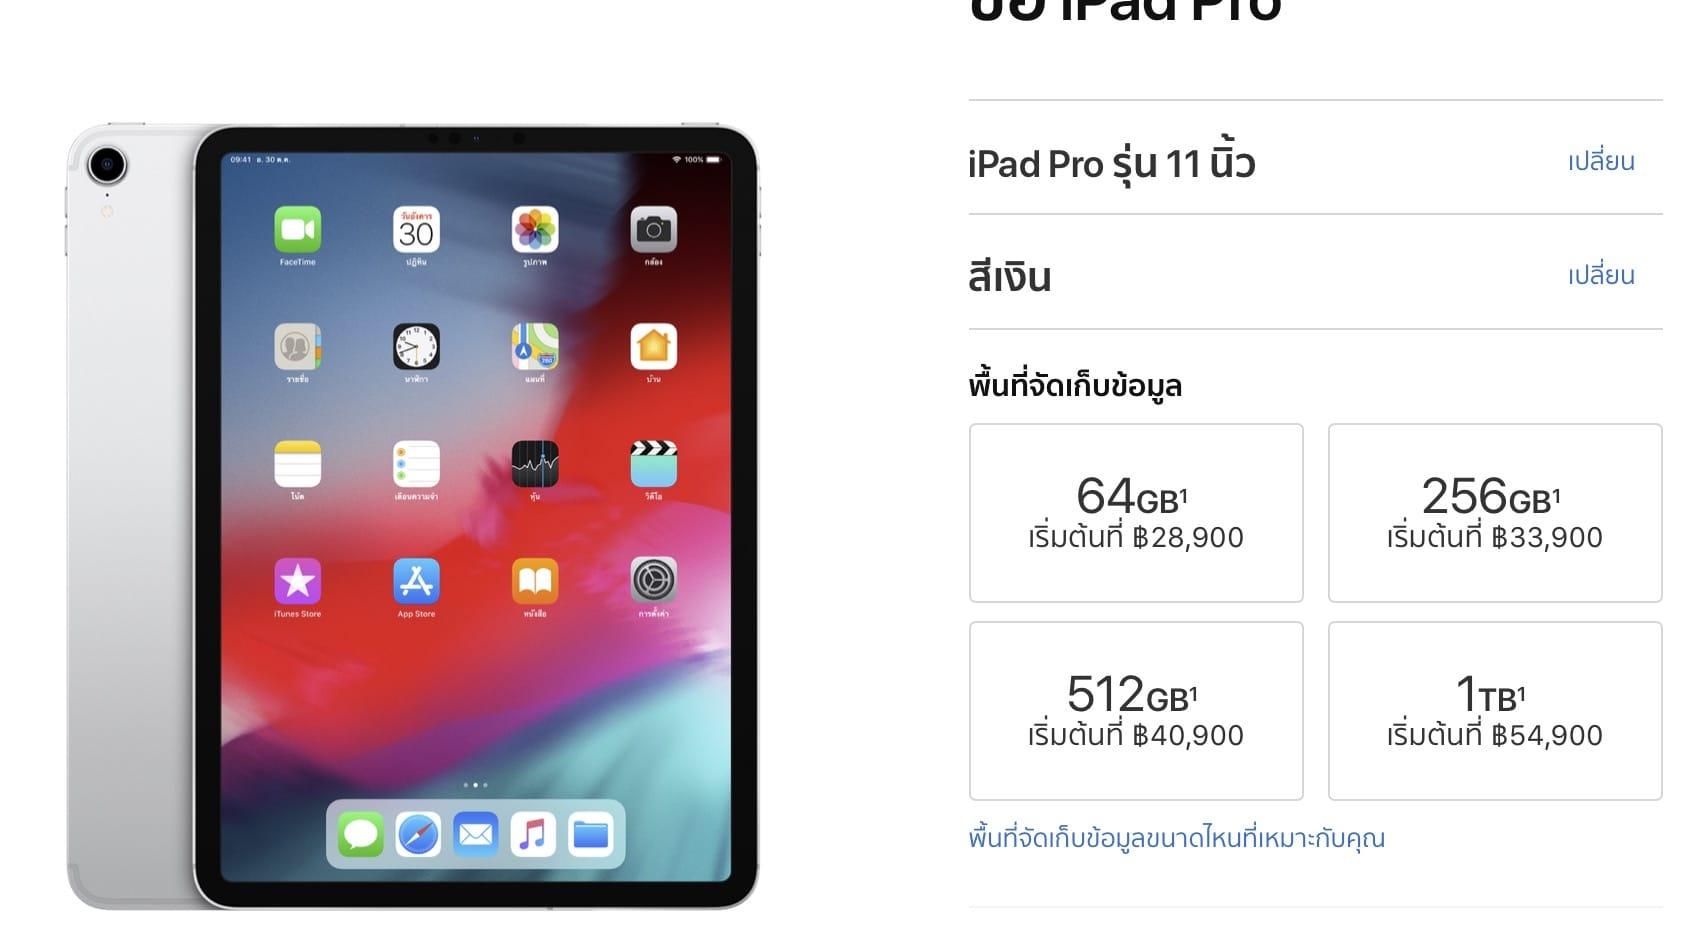 Ipad Pro 11 Inc Wifi ราคา 2